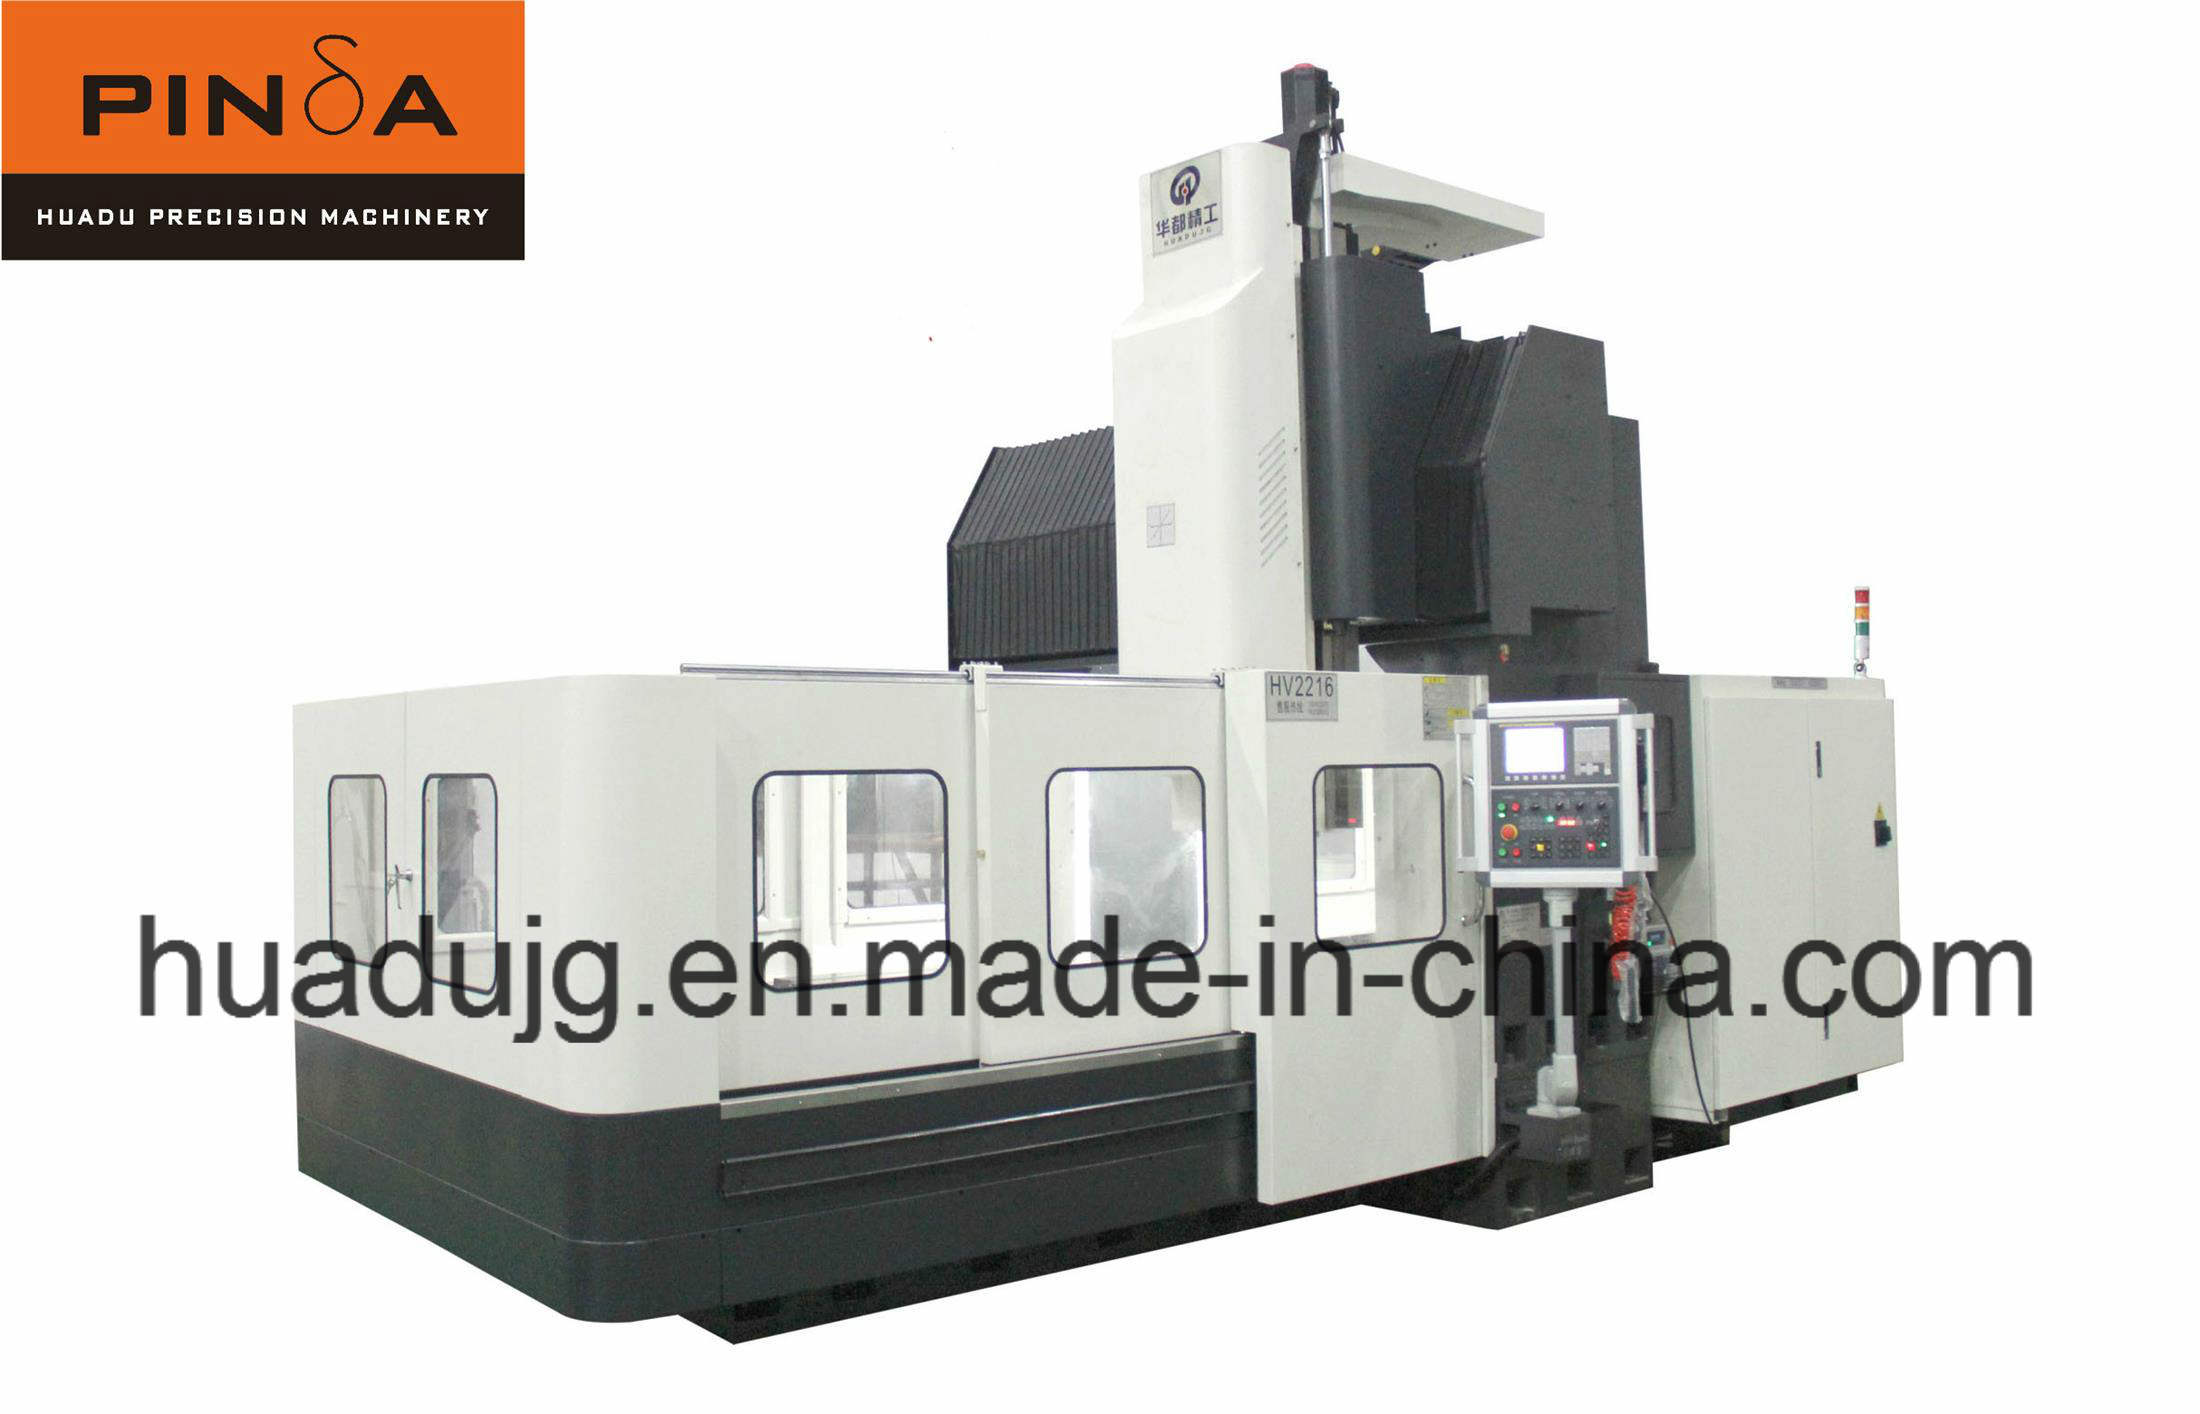 Integral Gantry Vertical CNC Machine Hv3220